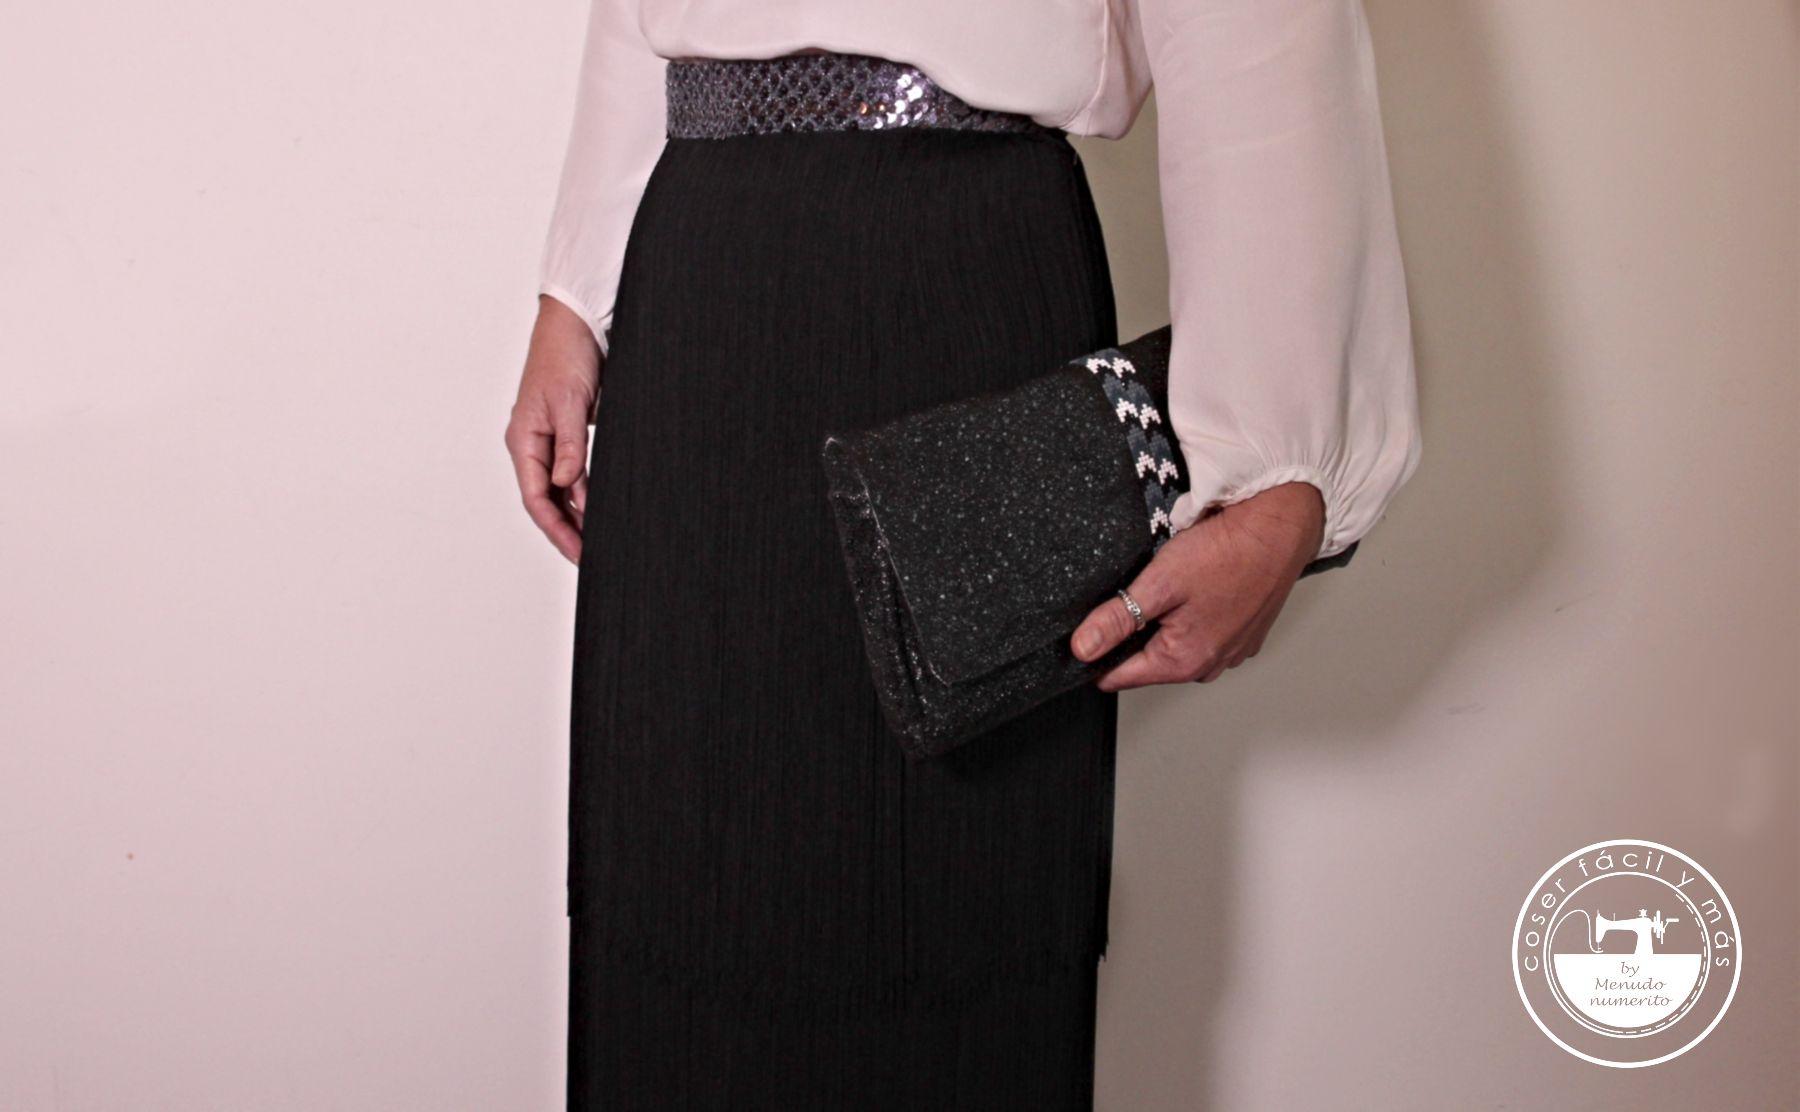 falda de flecos coser facil menudo numerito blgos de costura torcal